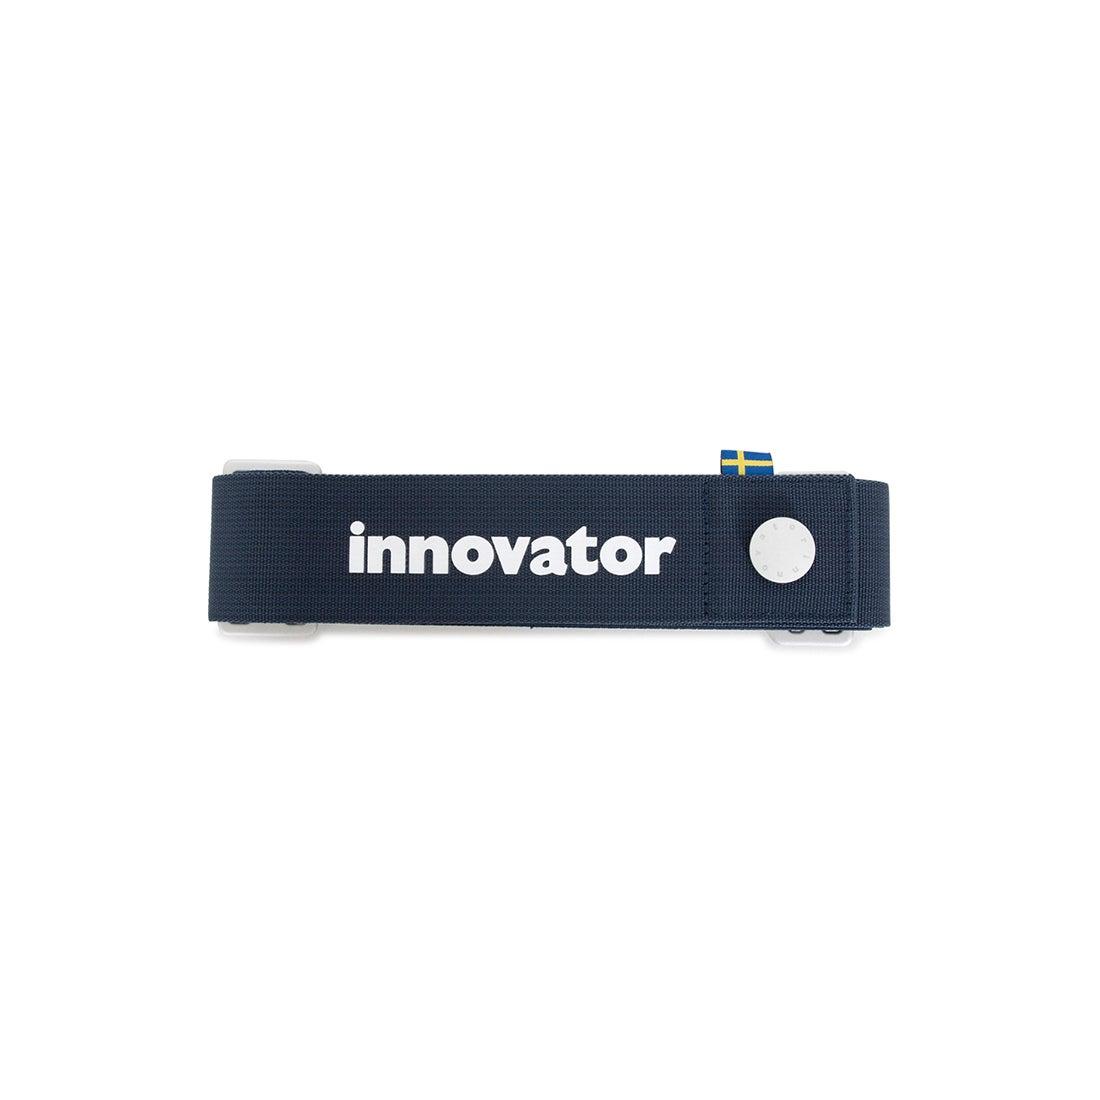 【SAC'S BAR】イノベーター innovator スーツケースベルト INT11B NAVY メンズ